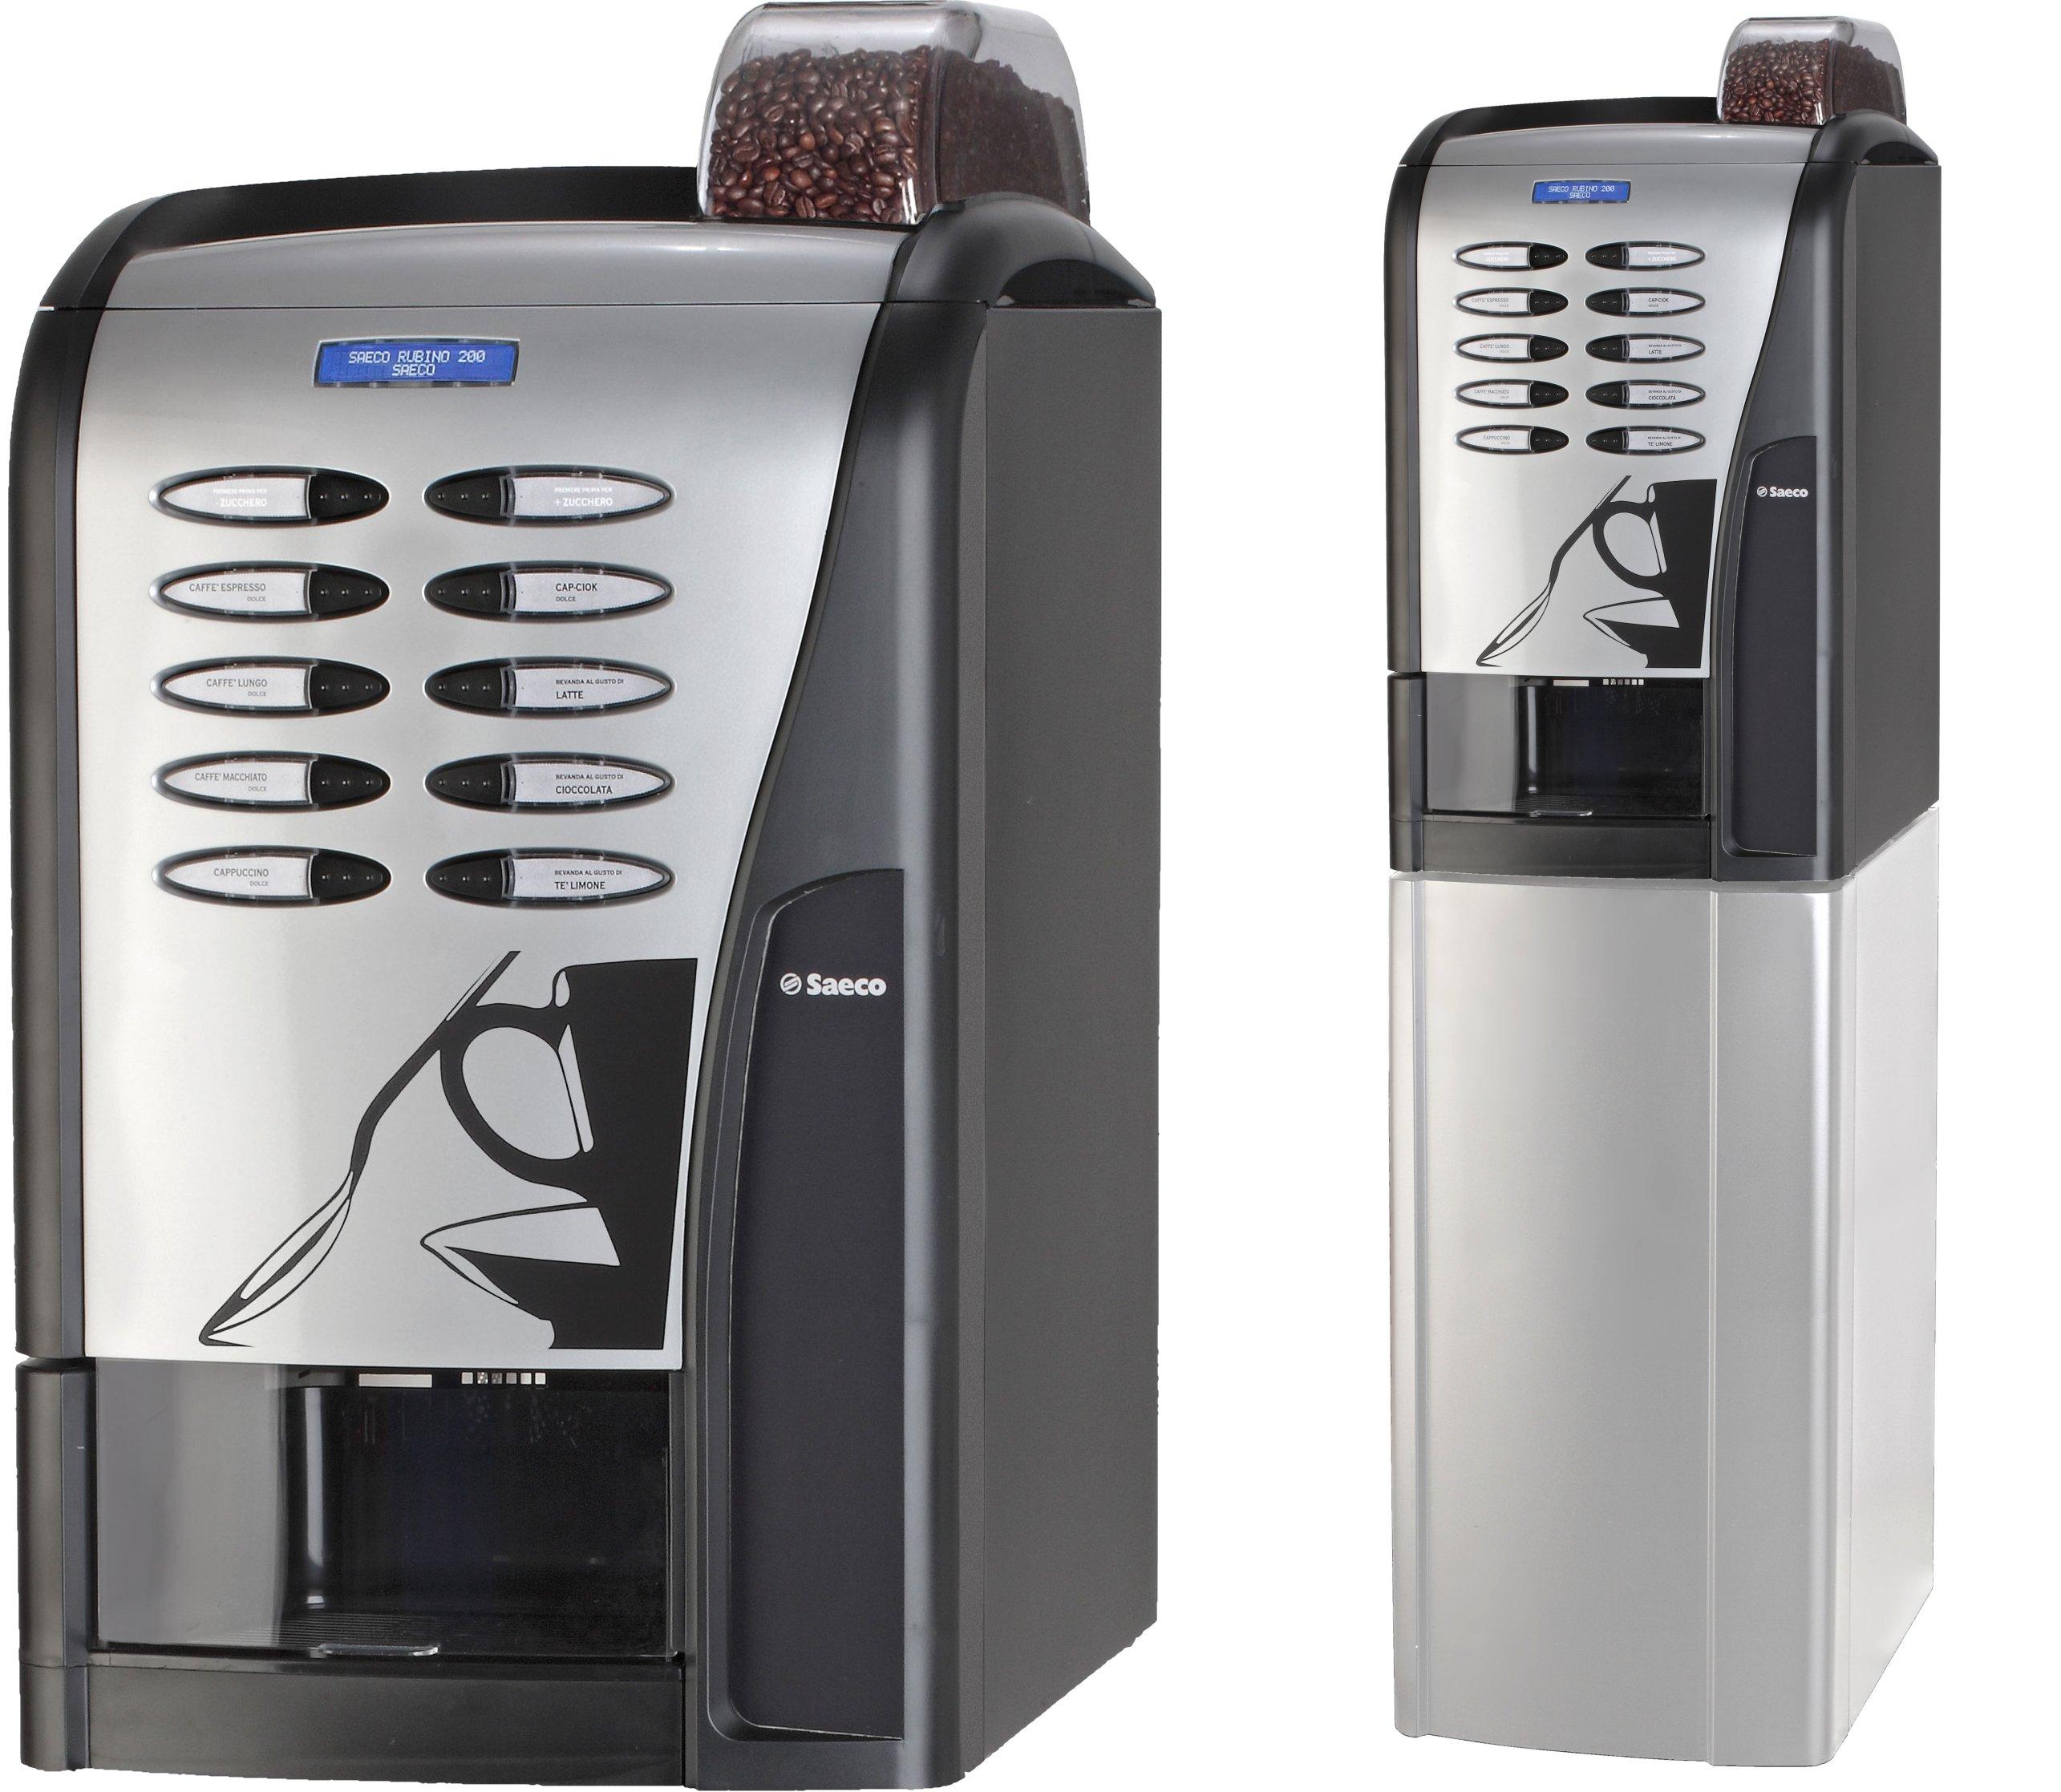 saeco vending coffee machine